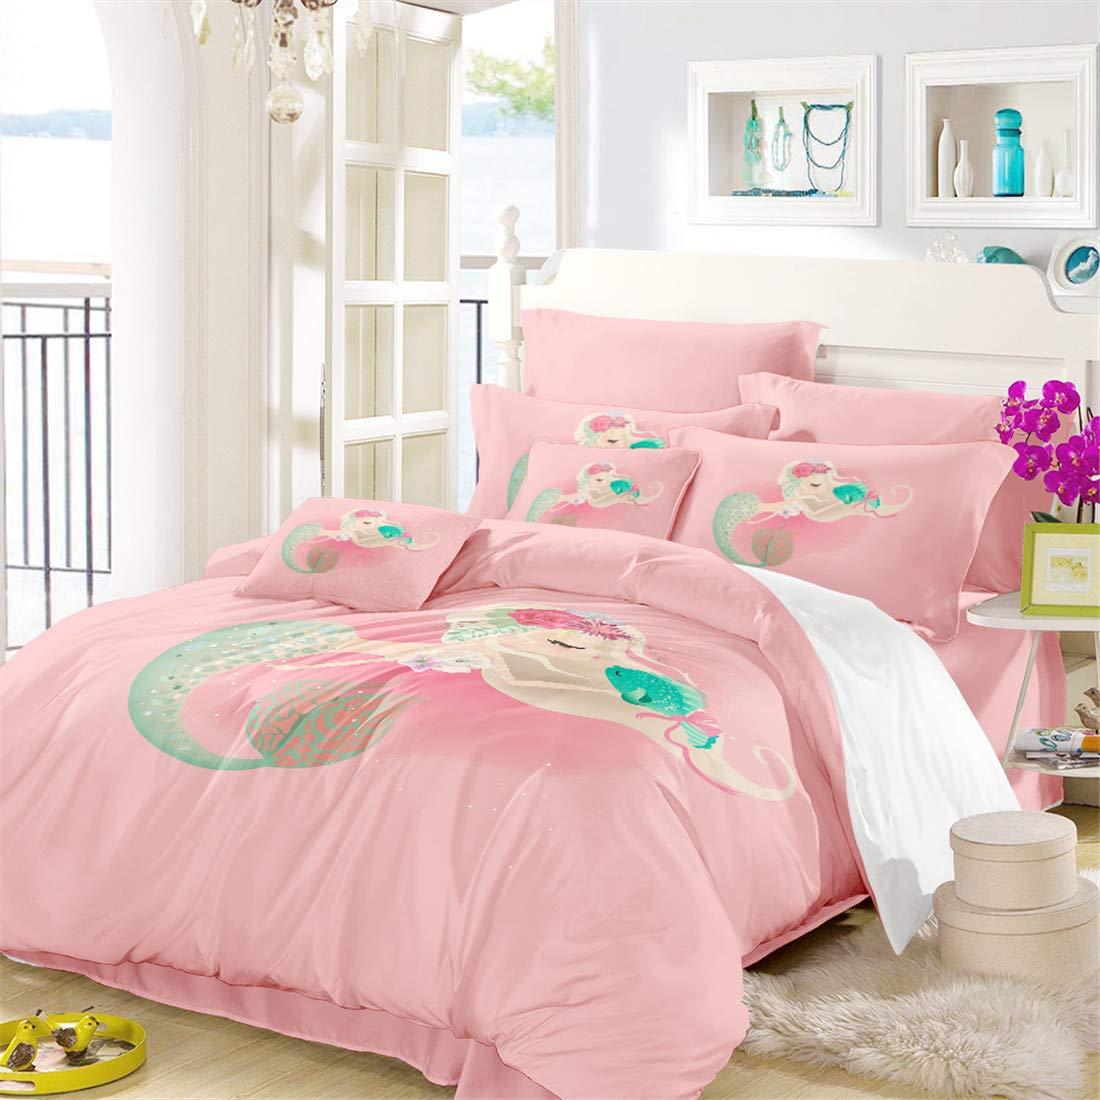 2c45faee5c1724 Amazon.com: Oliven Cartoon Mermaid Bedding Set Full Size Girls Duvet Cover Full  Size Pink 3 Piece Home Decor: Home & Kitchen